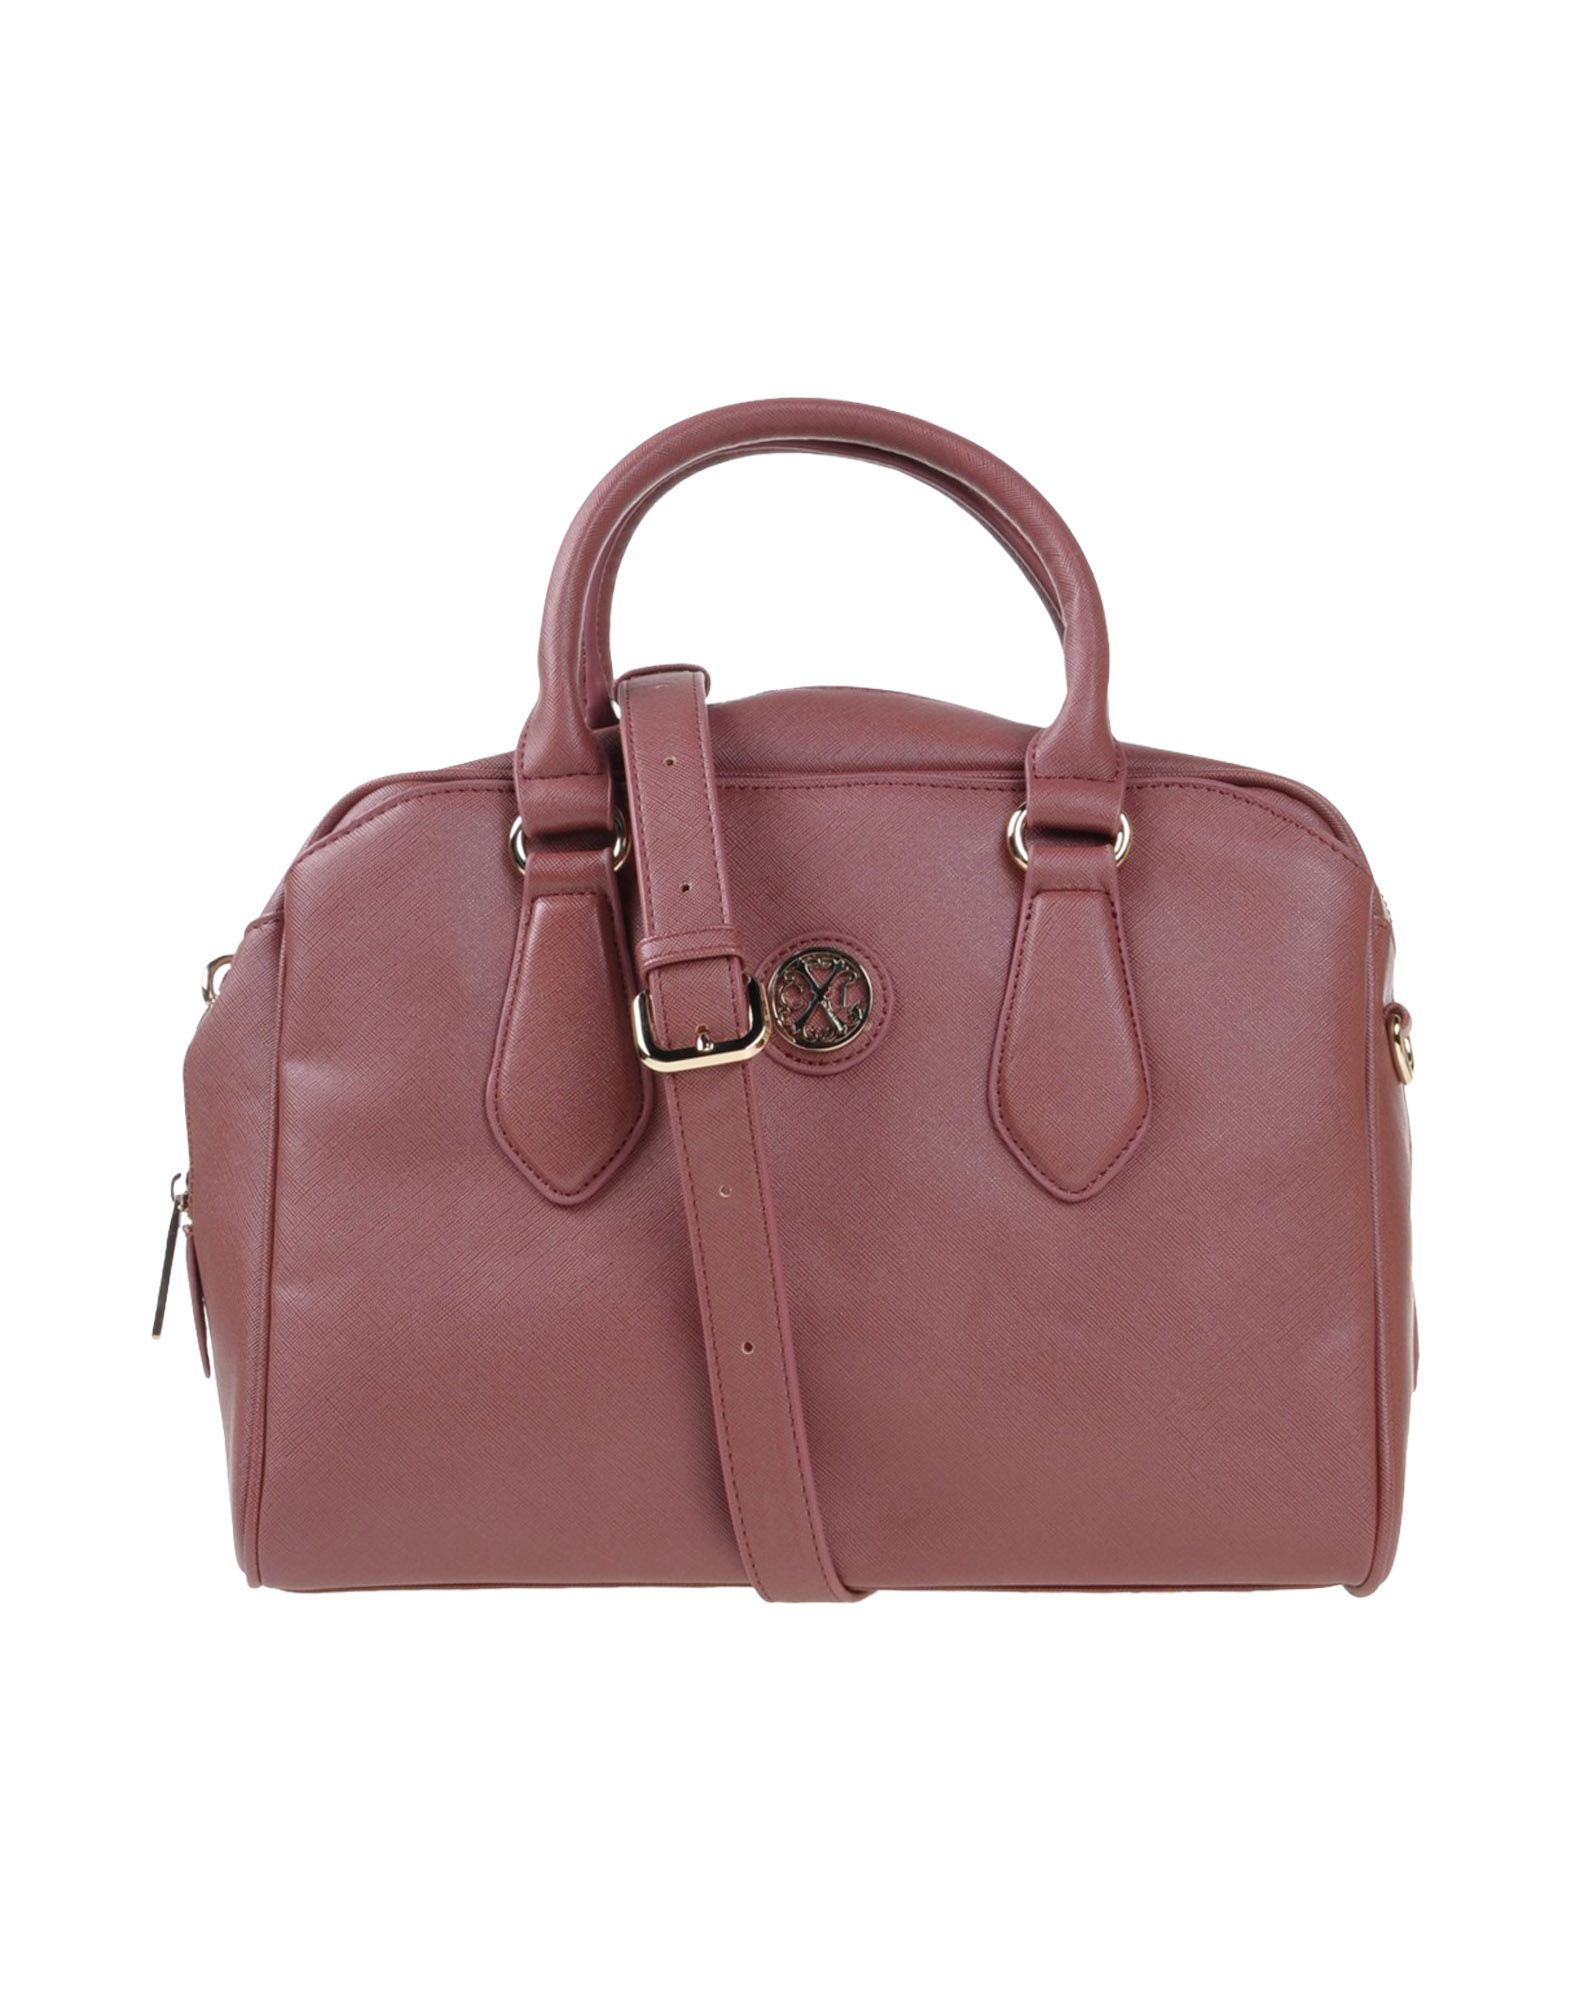 Lyst Christian Lacroix Handbag In Pink